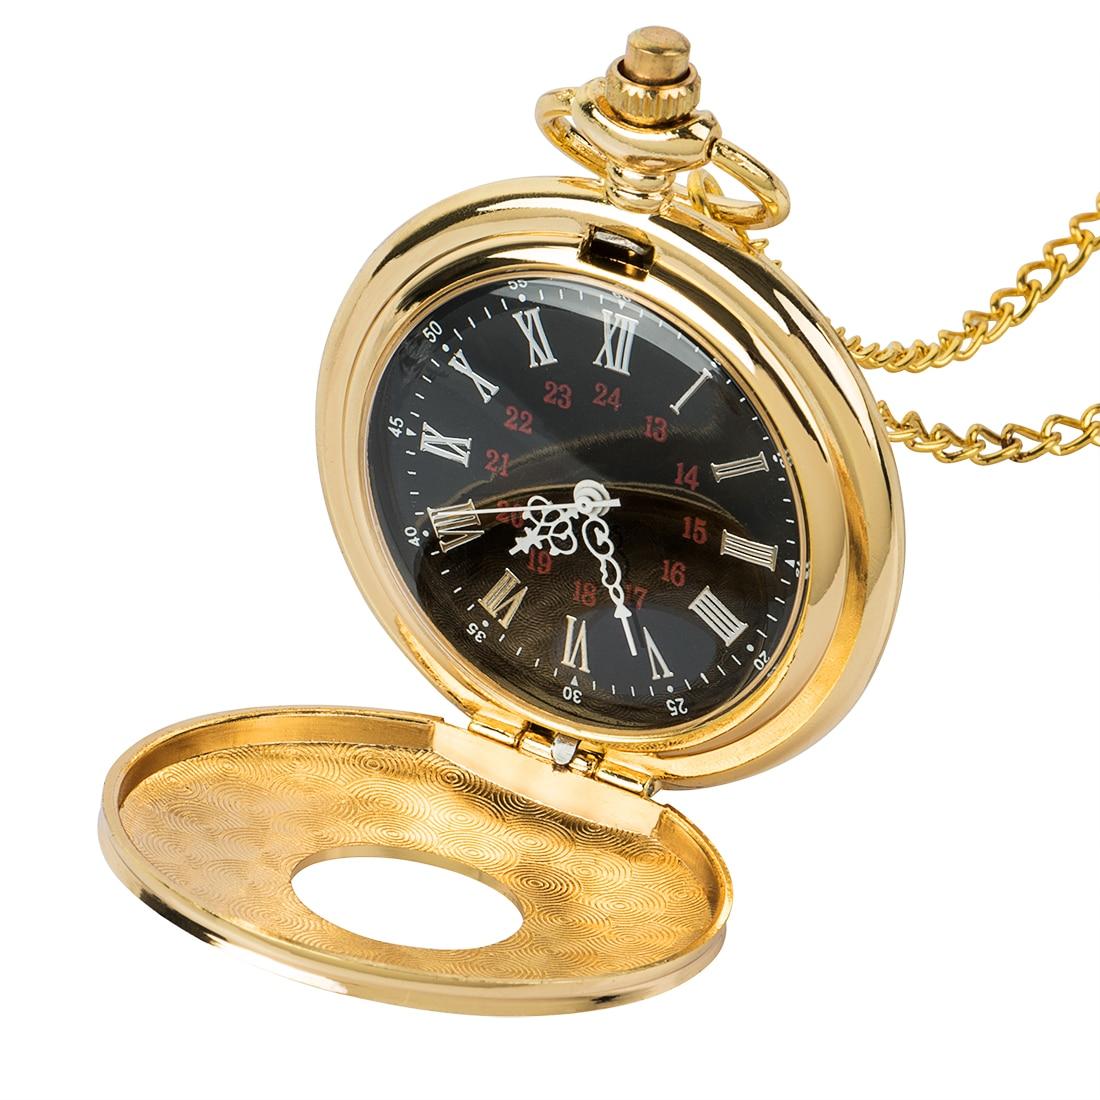 Golden Men Women Pocket Watch Full Double Hunter Mechanical Pocket Watches Engraved Roman Numerals Gold Hand Wind Pocketwatch